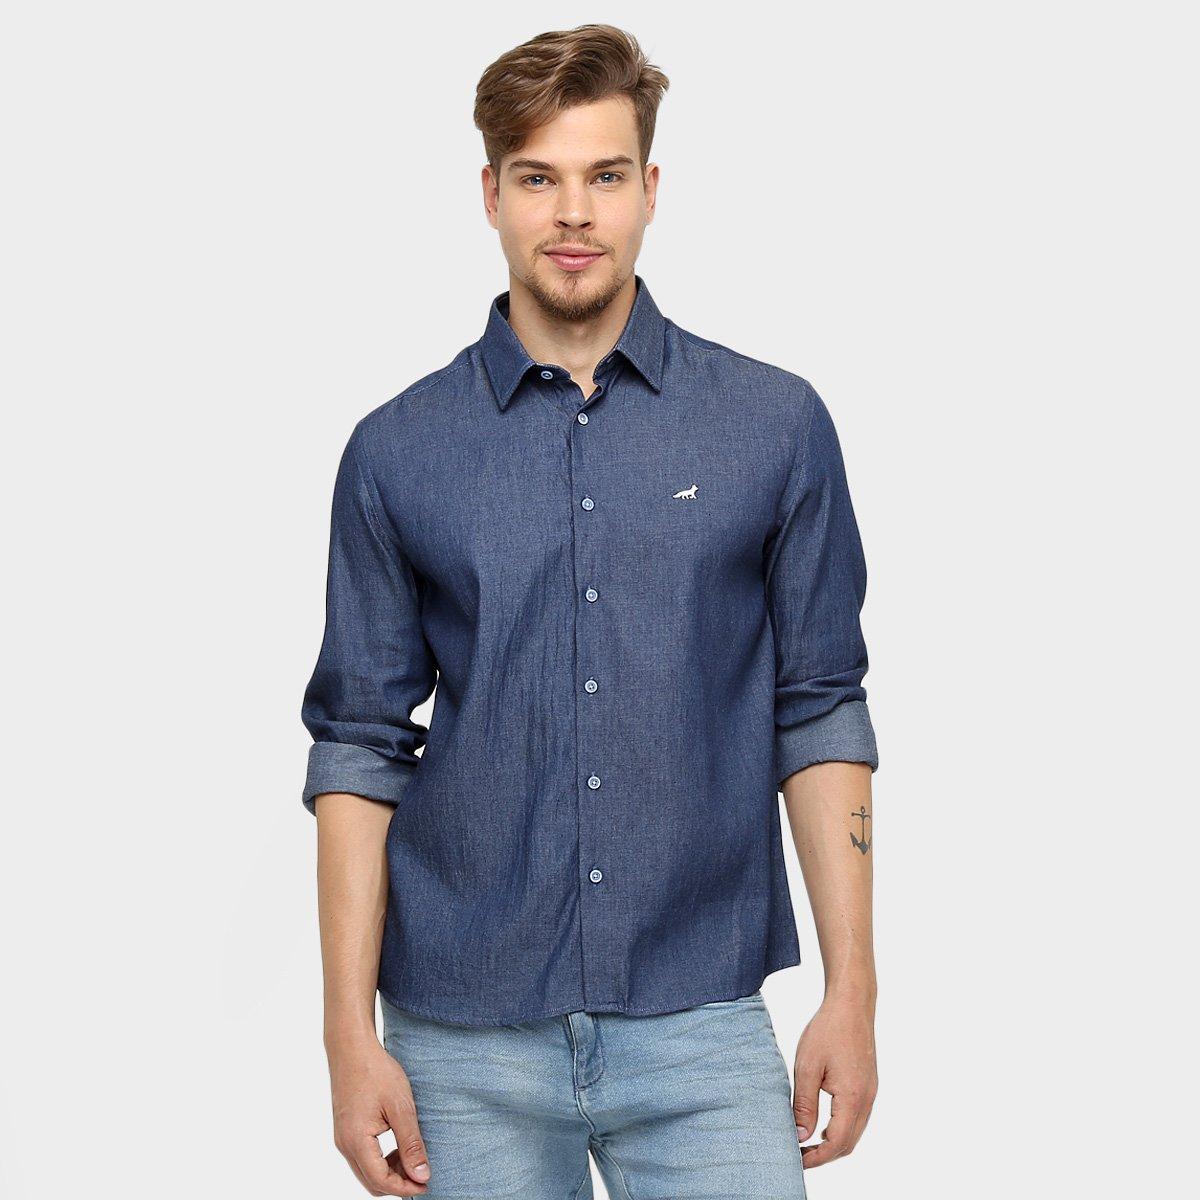 Camisa Social Palla D Oro Cruzeiro Manga Longa - Compre Agora  075b7c468917f